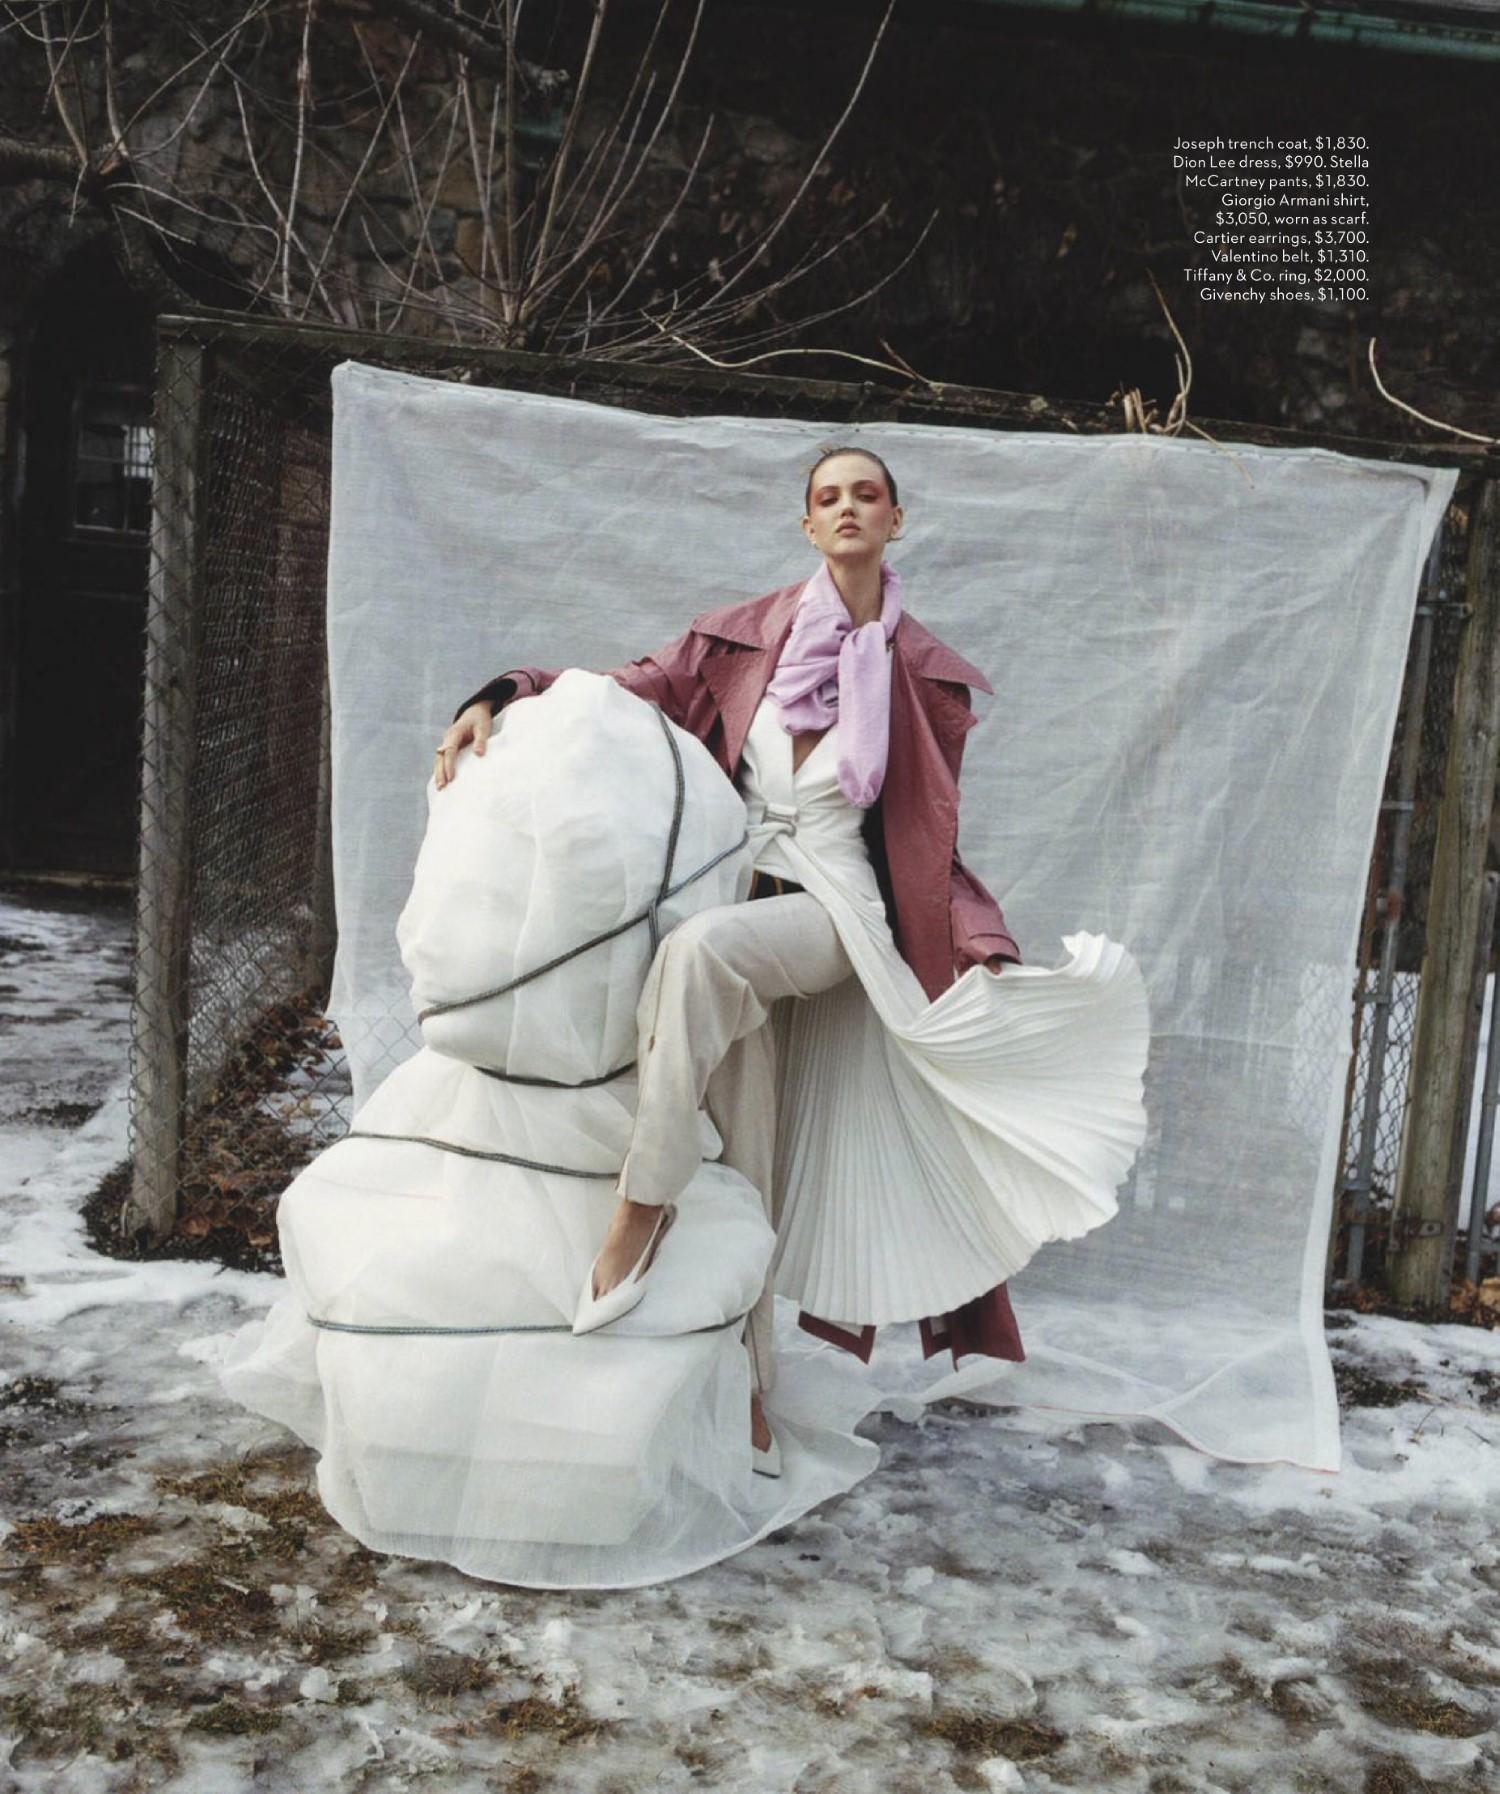 Lindsey-Wixson-Vogue-Australia-April-2019- (3).jpg